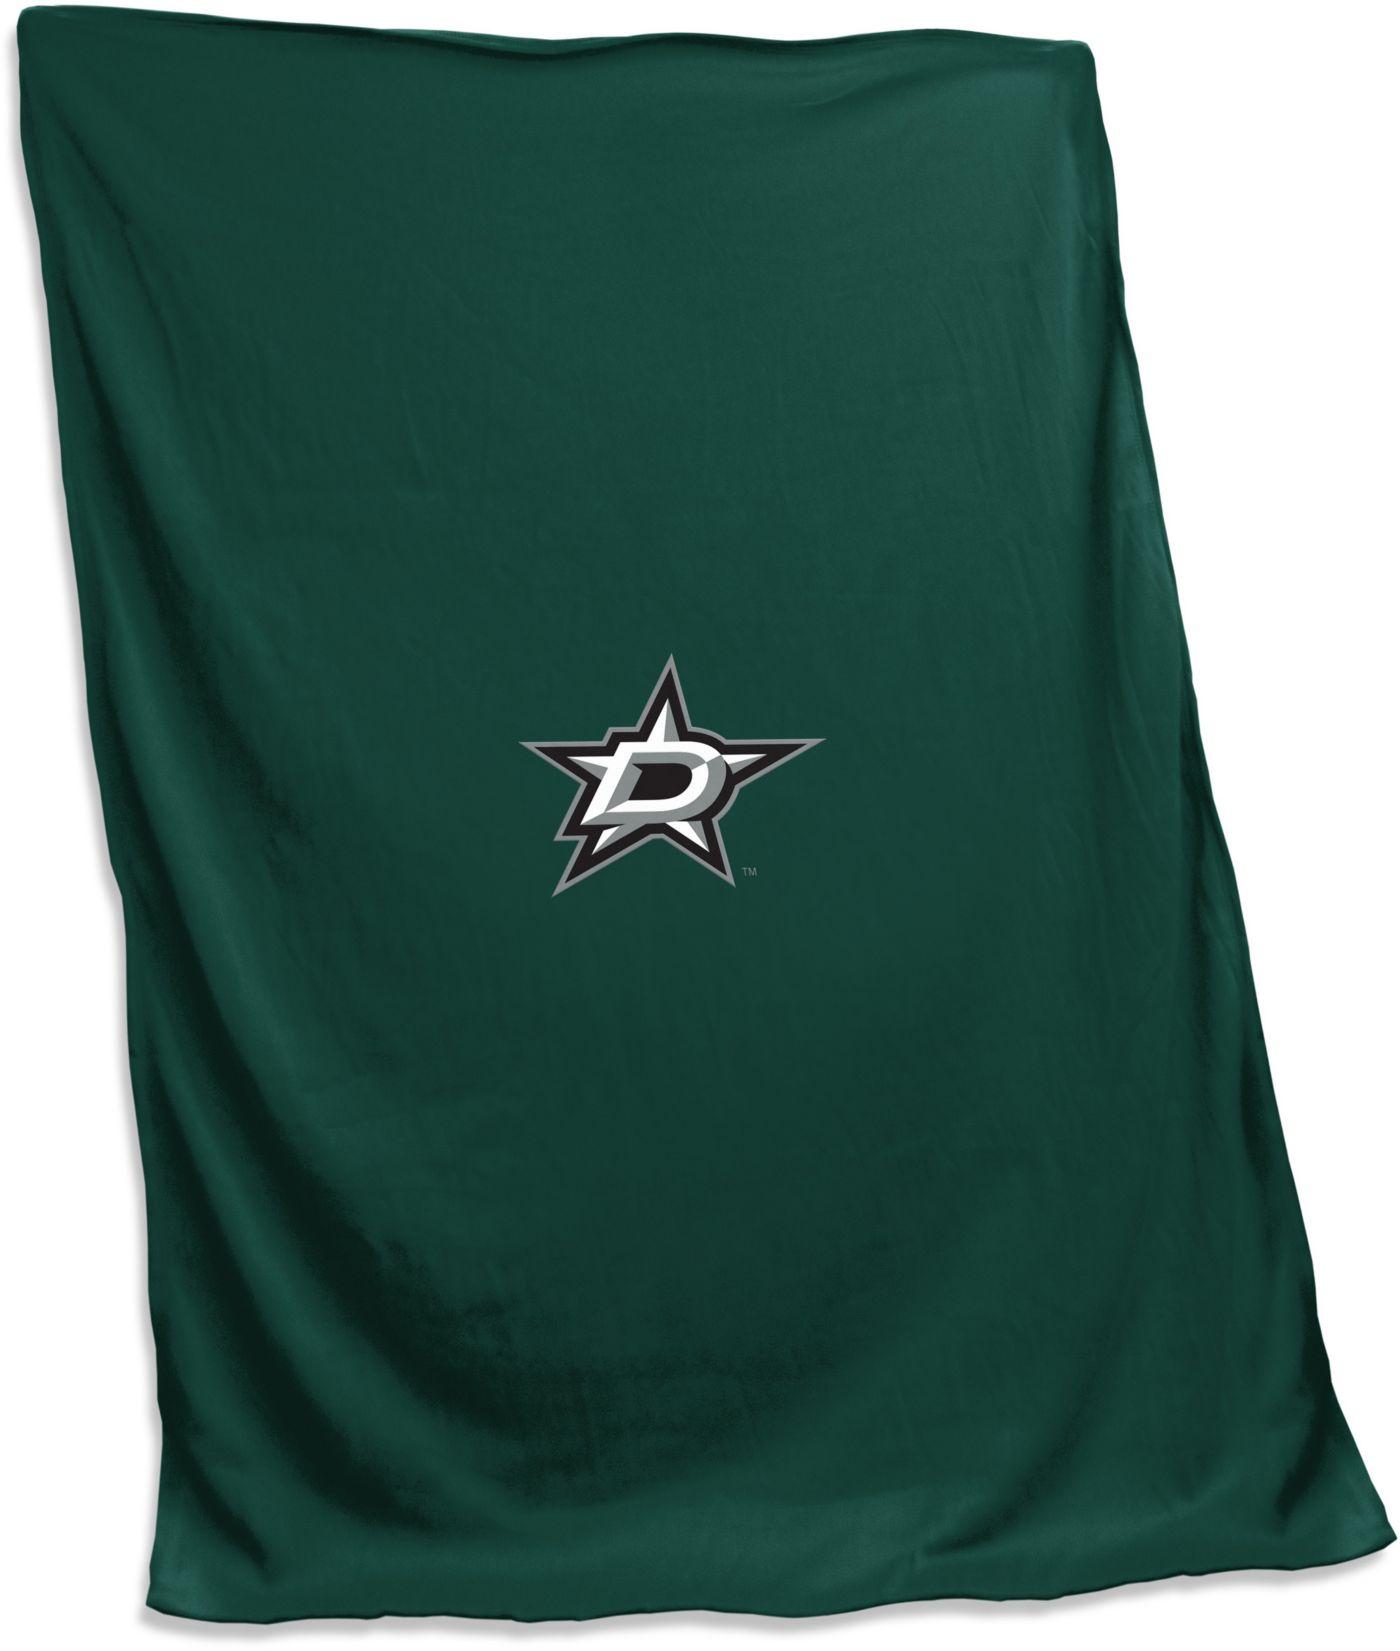 Dallas Stars Sweatshirt Blanket